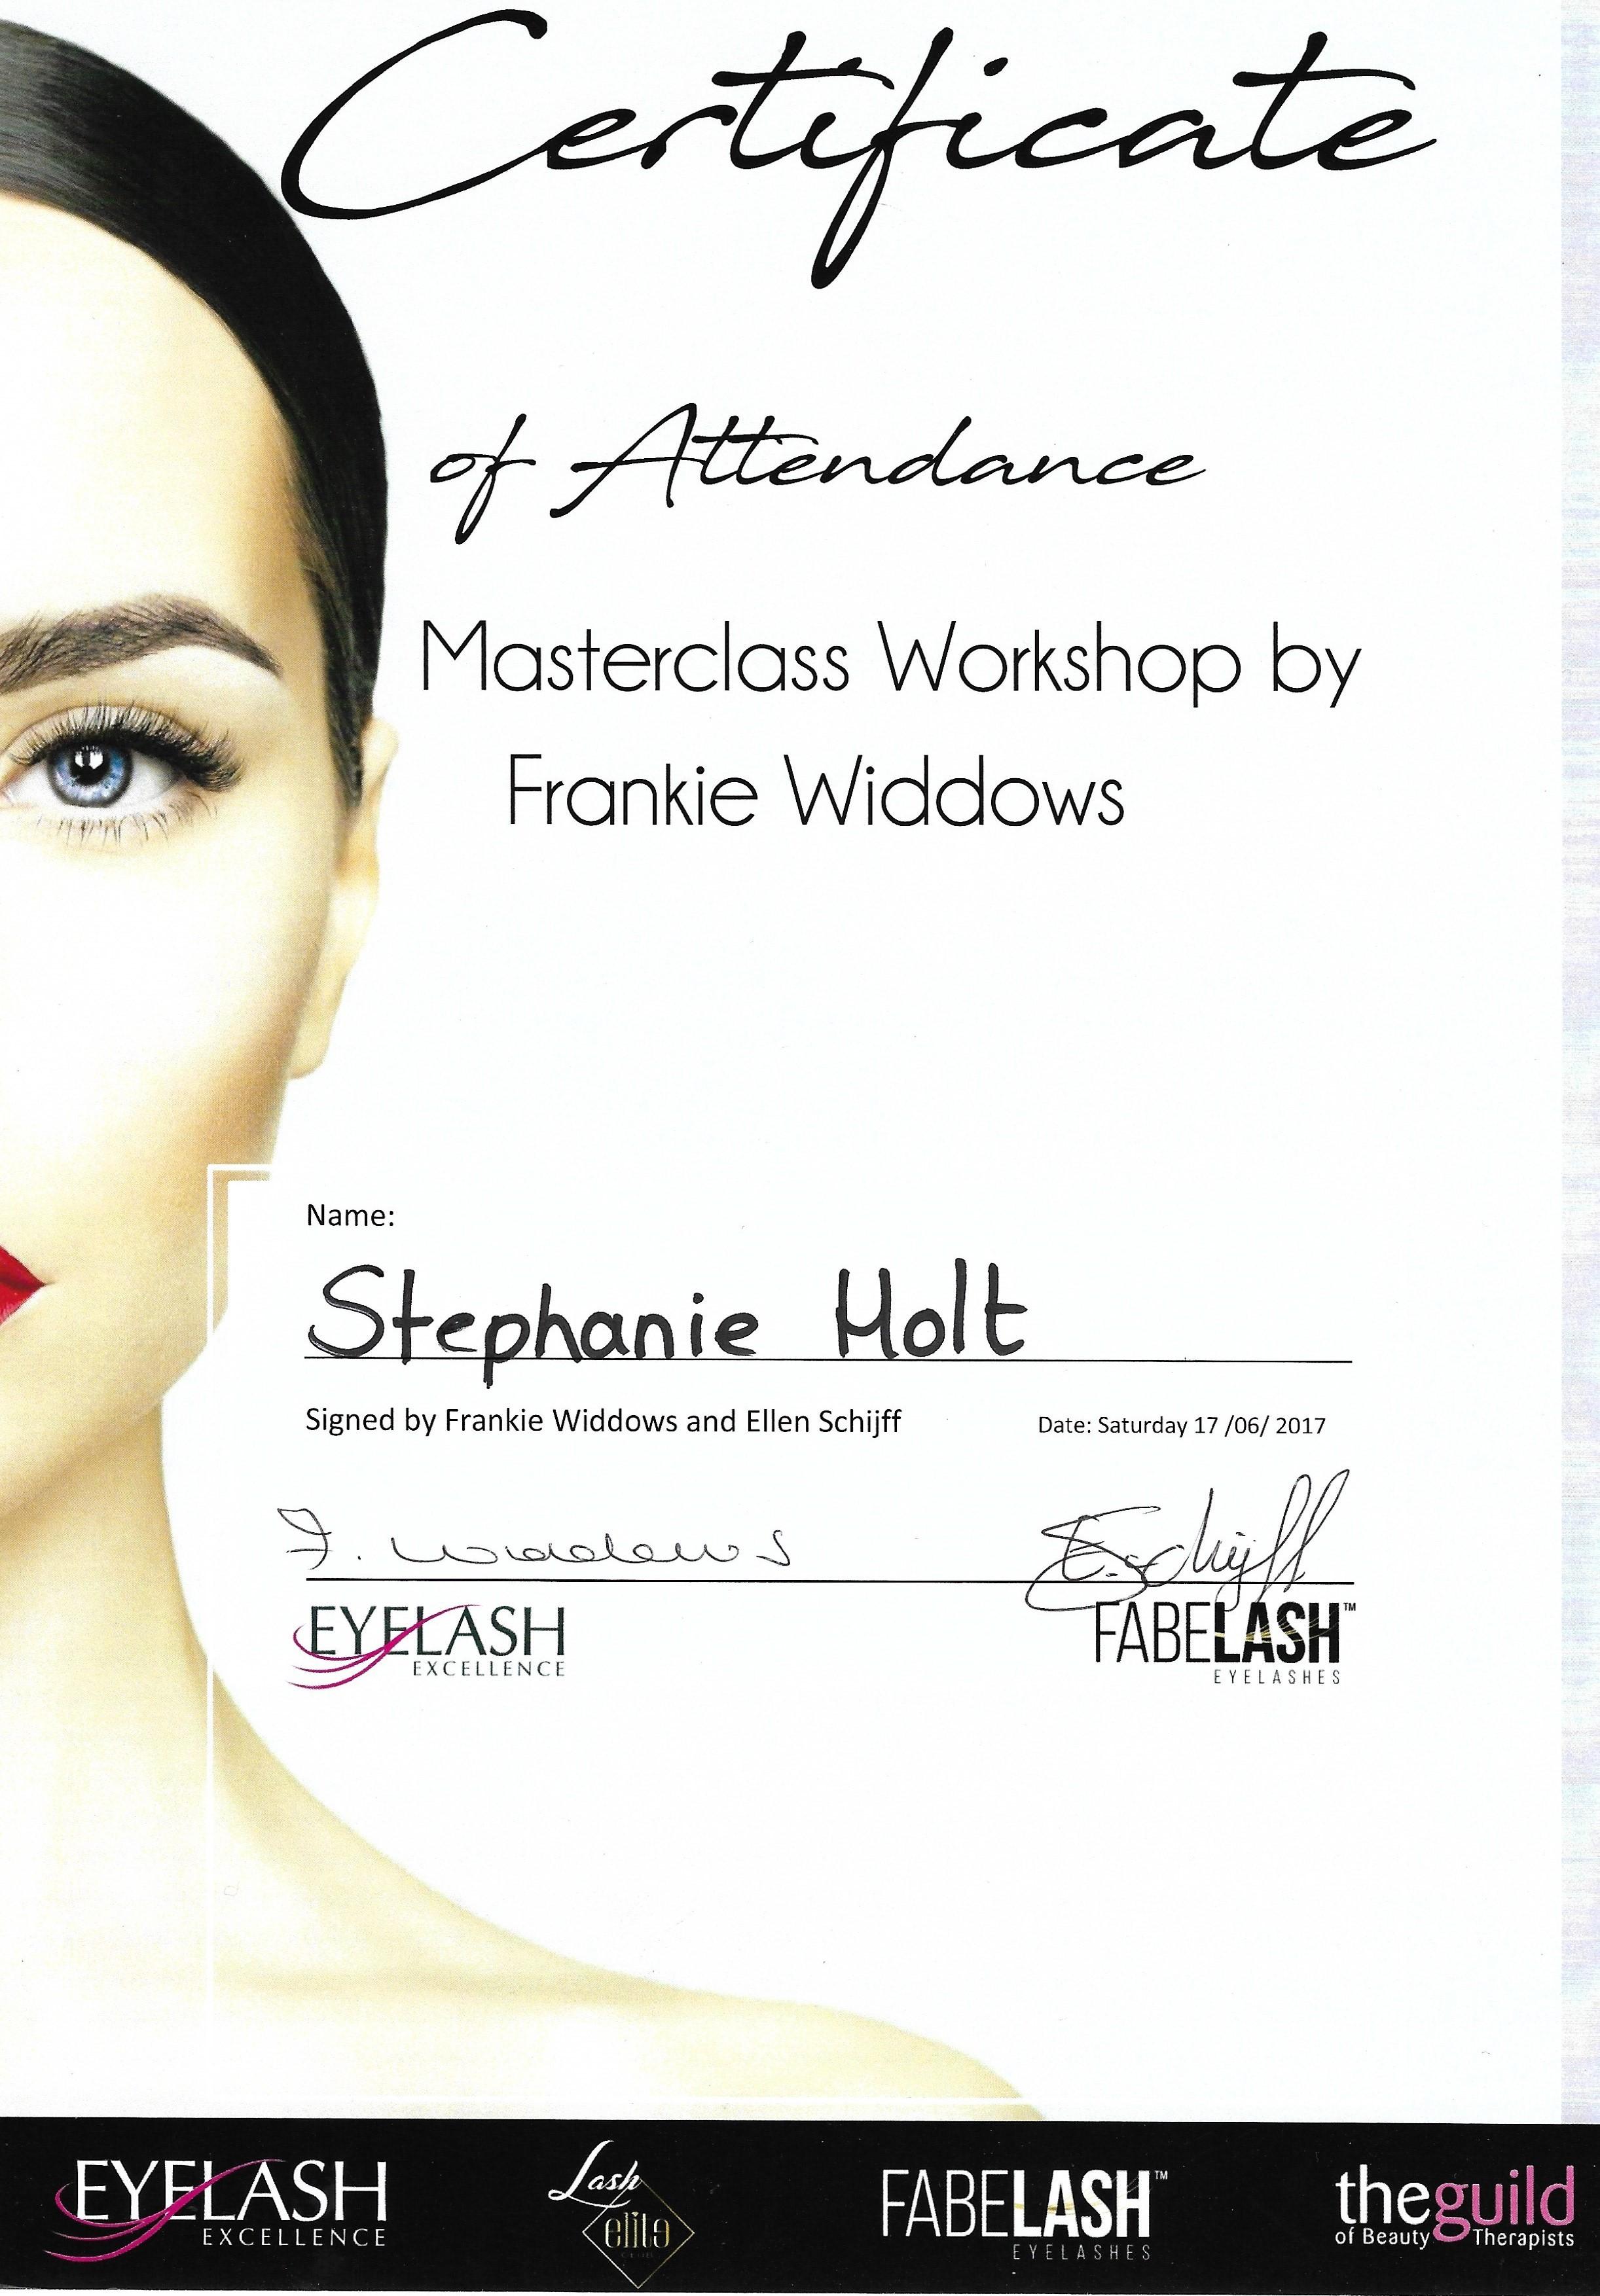 Certificaat Masterclass Frankie Widdows